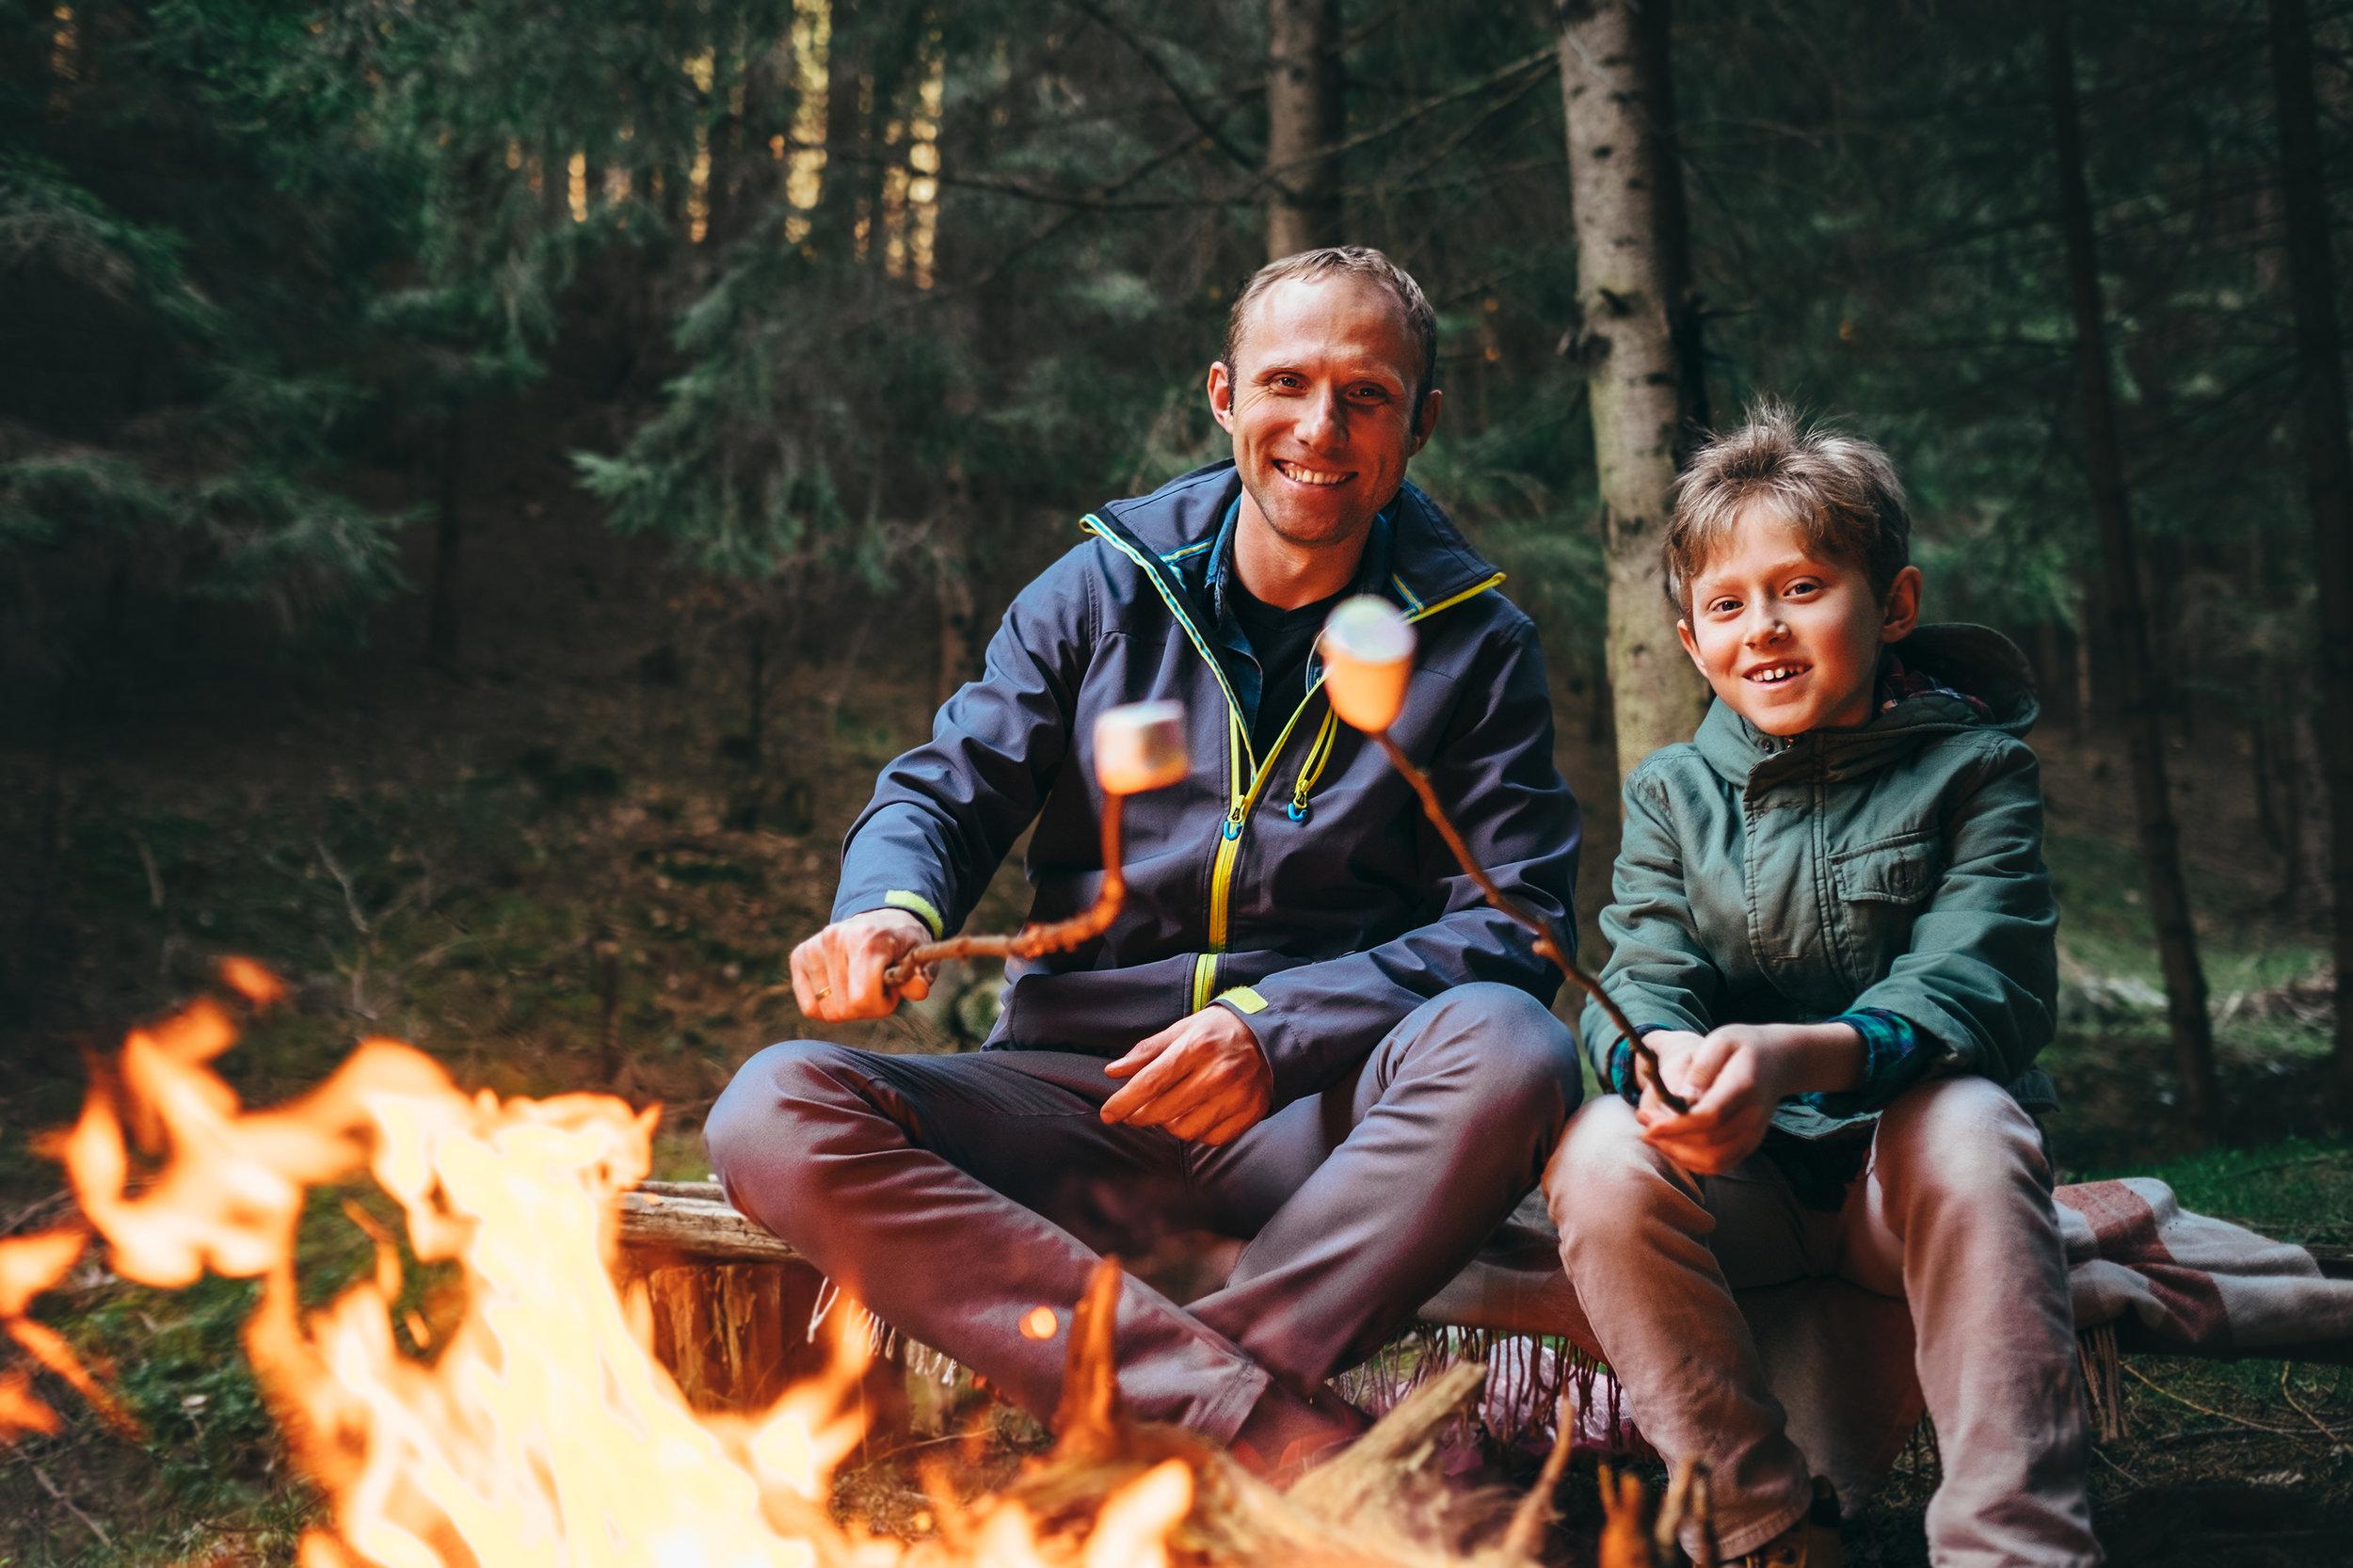 father son campfire - shutterstock_616109420.jpg